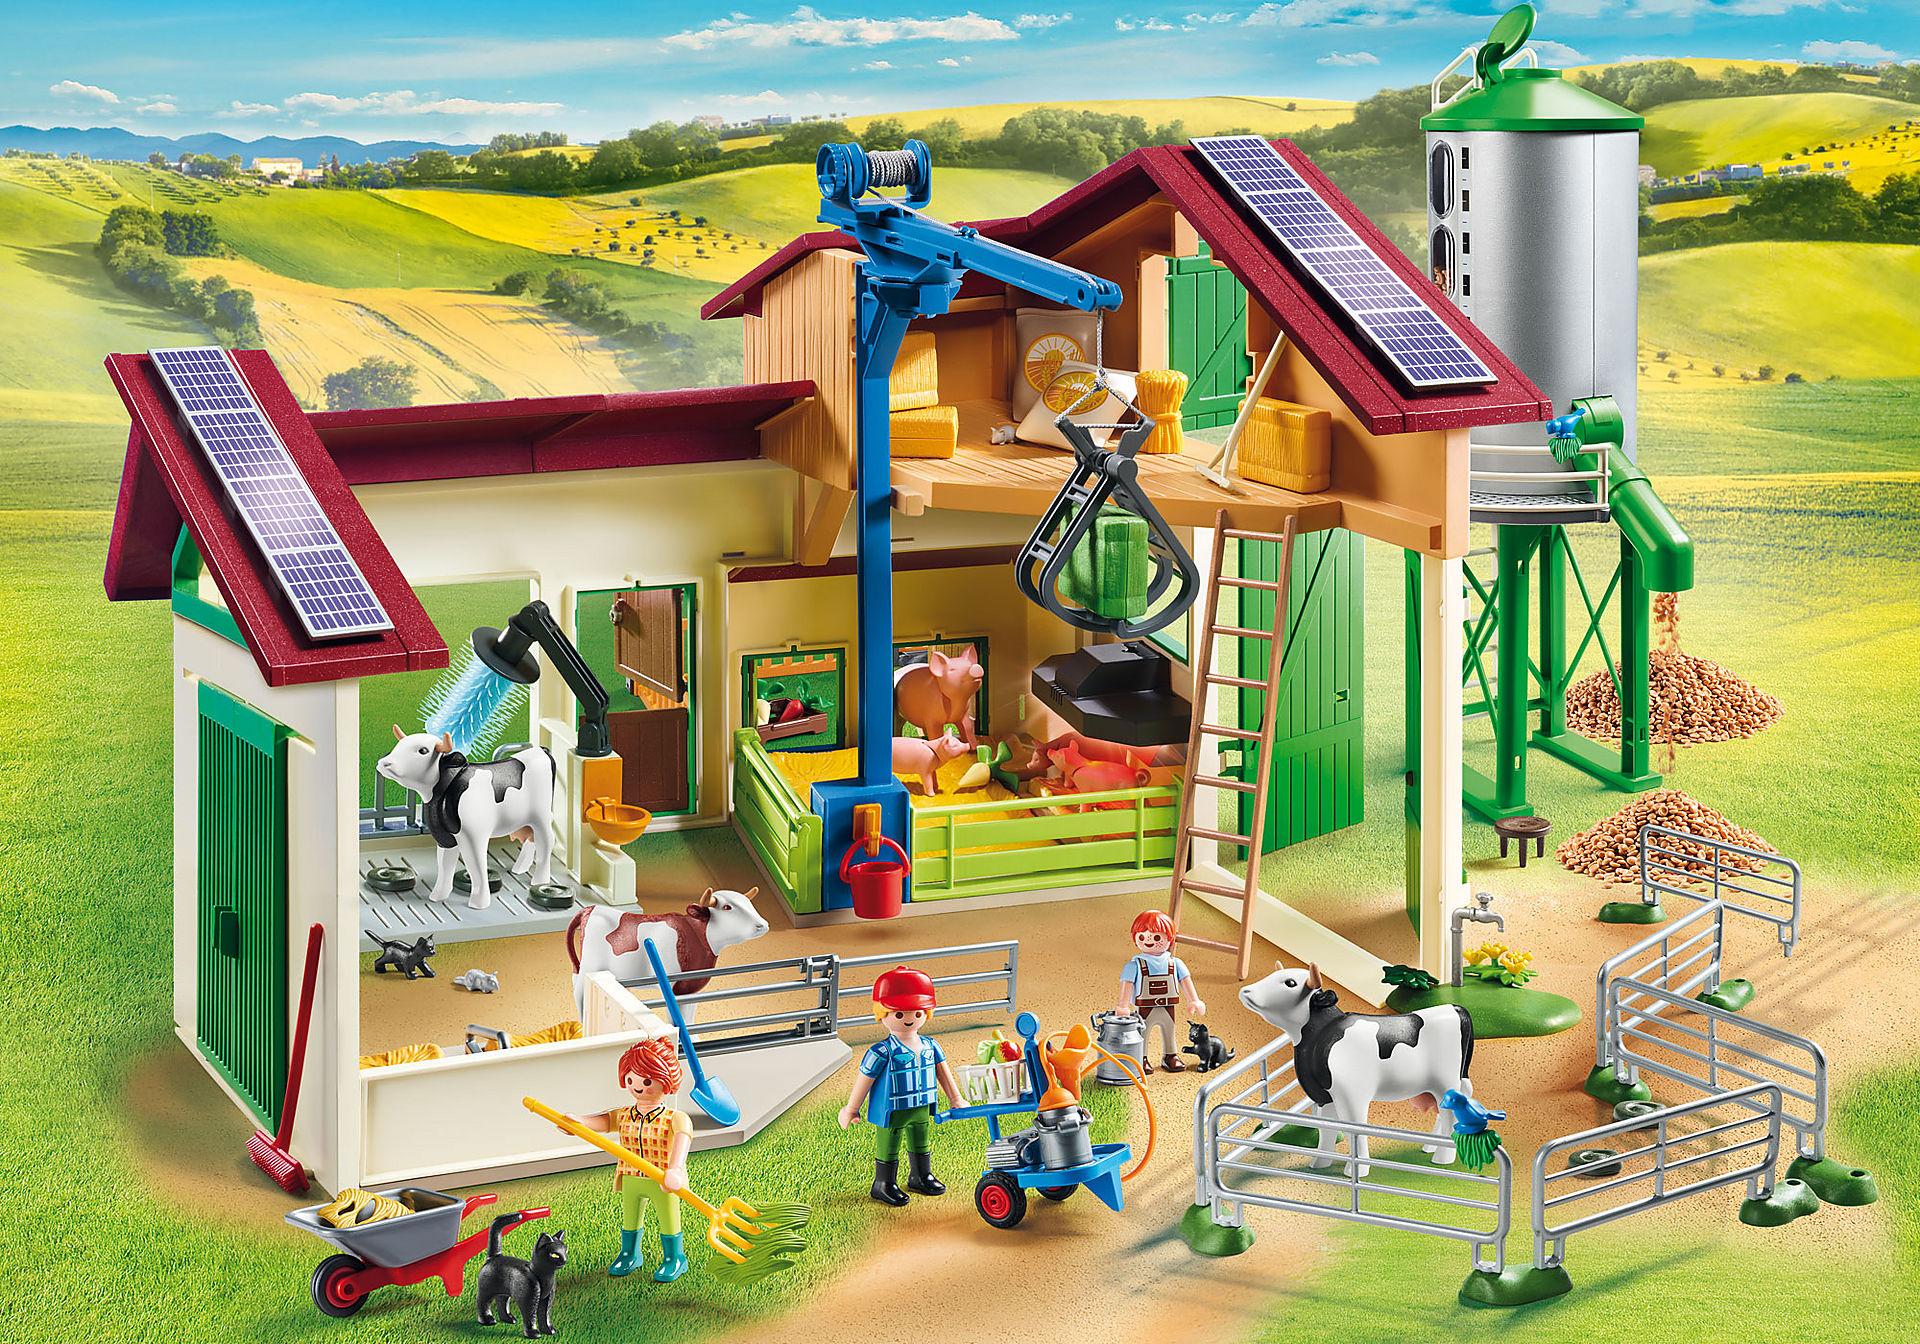 http://media.playmobil.com/i/playmobil/70132_product_detail/Boerderij met silo en dieren